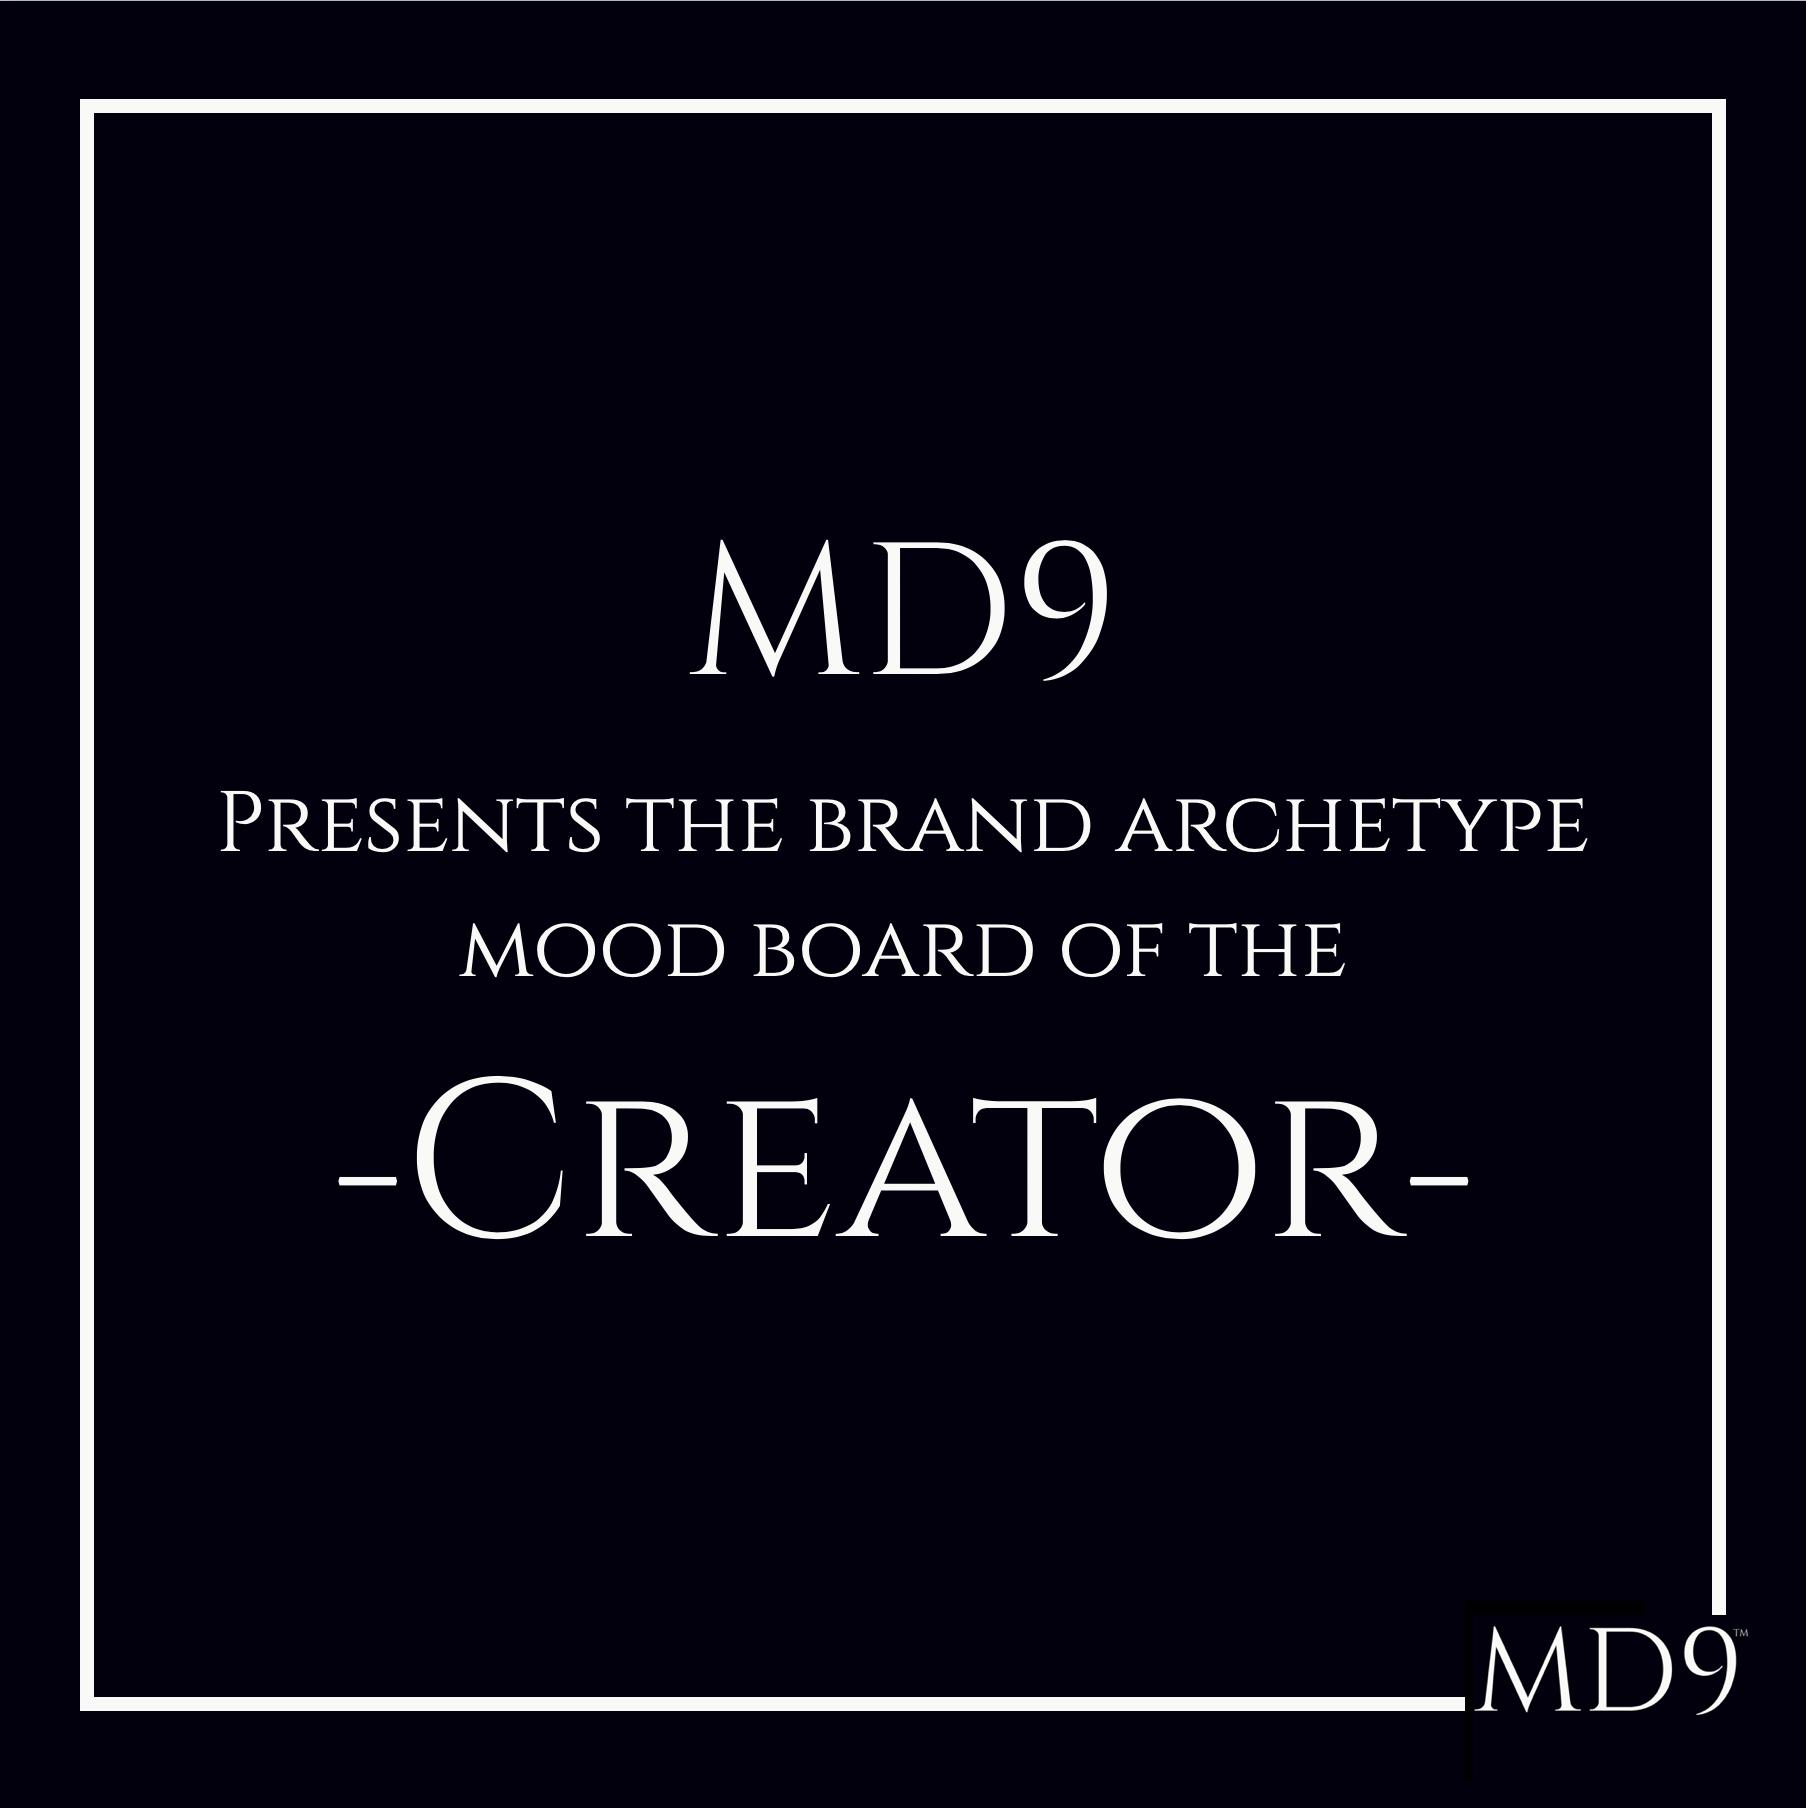 MD9's Brand Archetype Mood Board – Creator